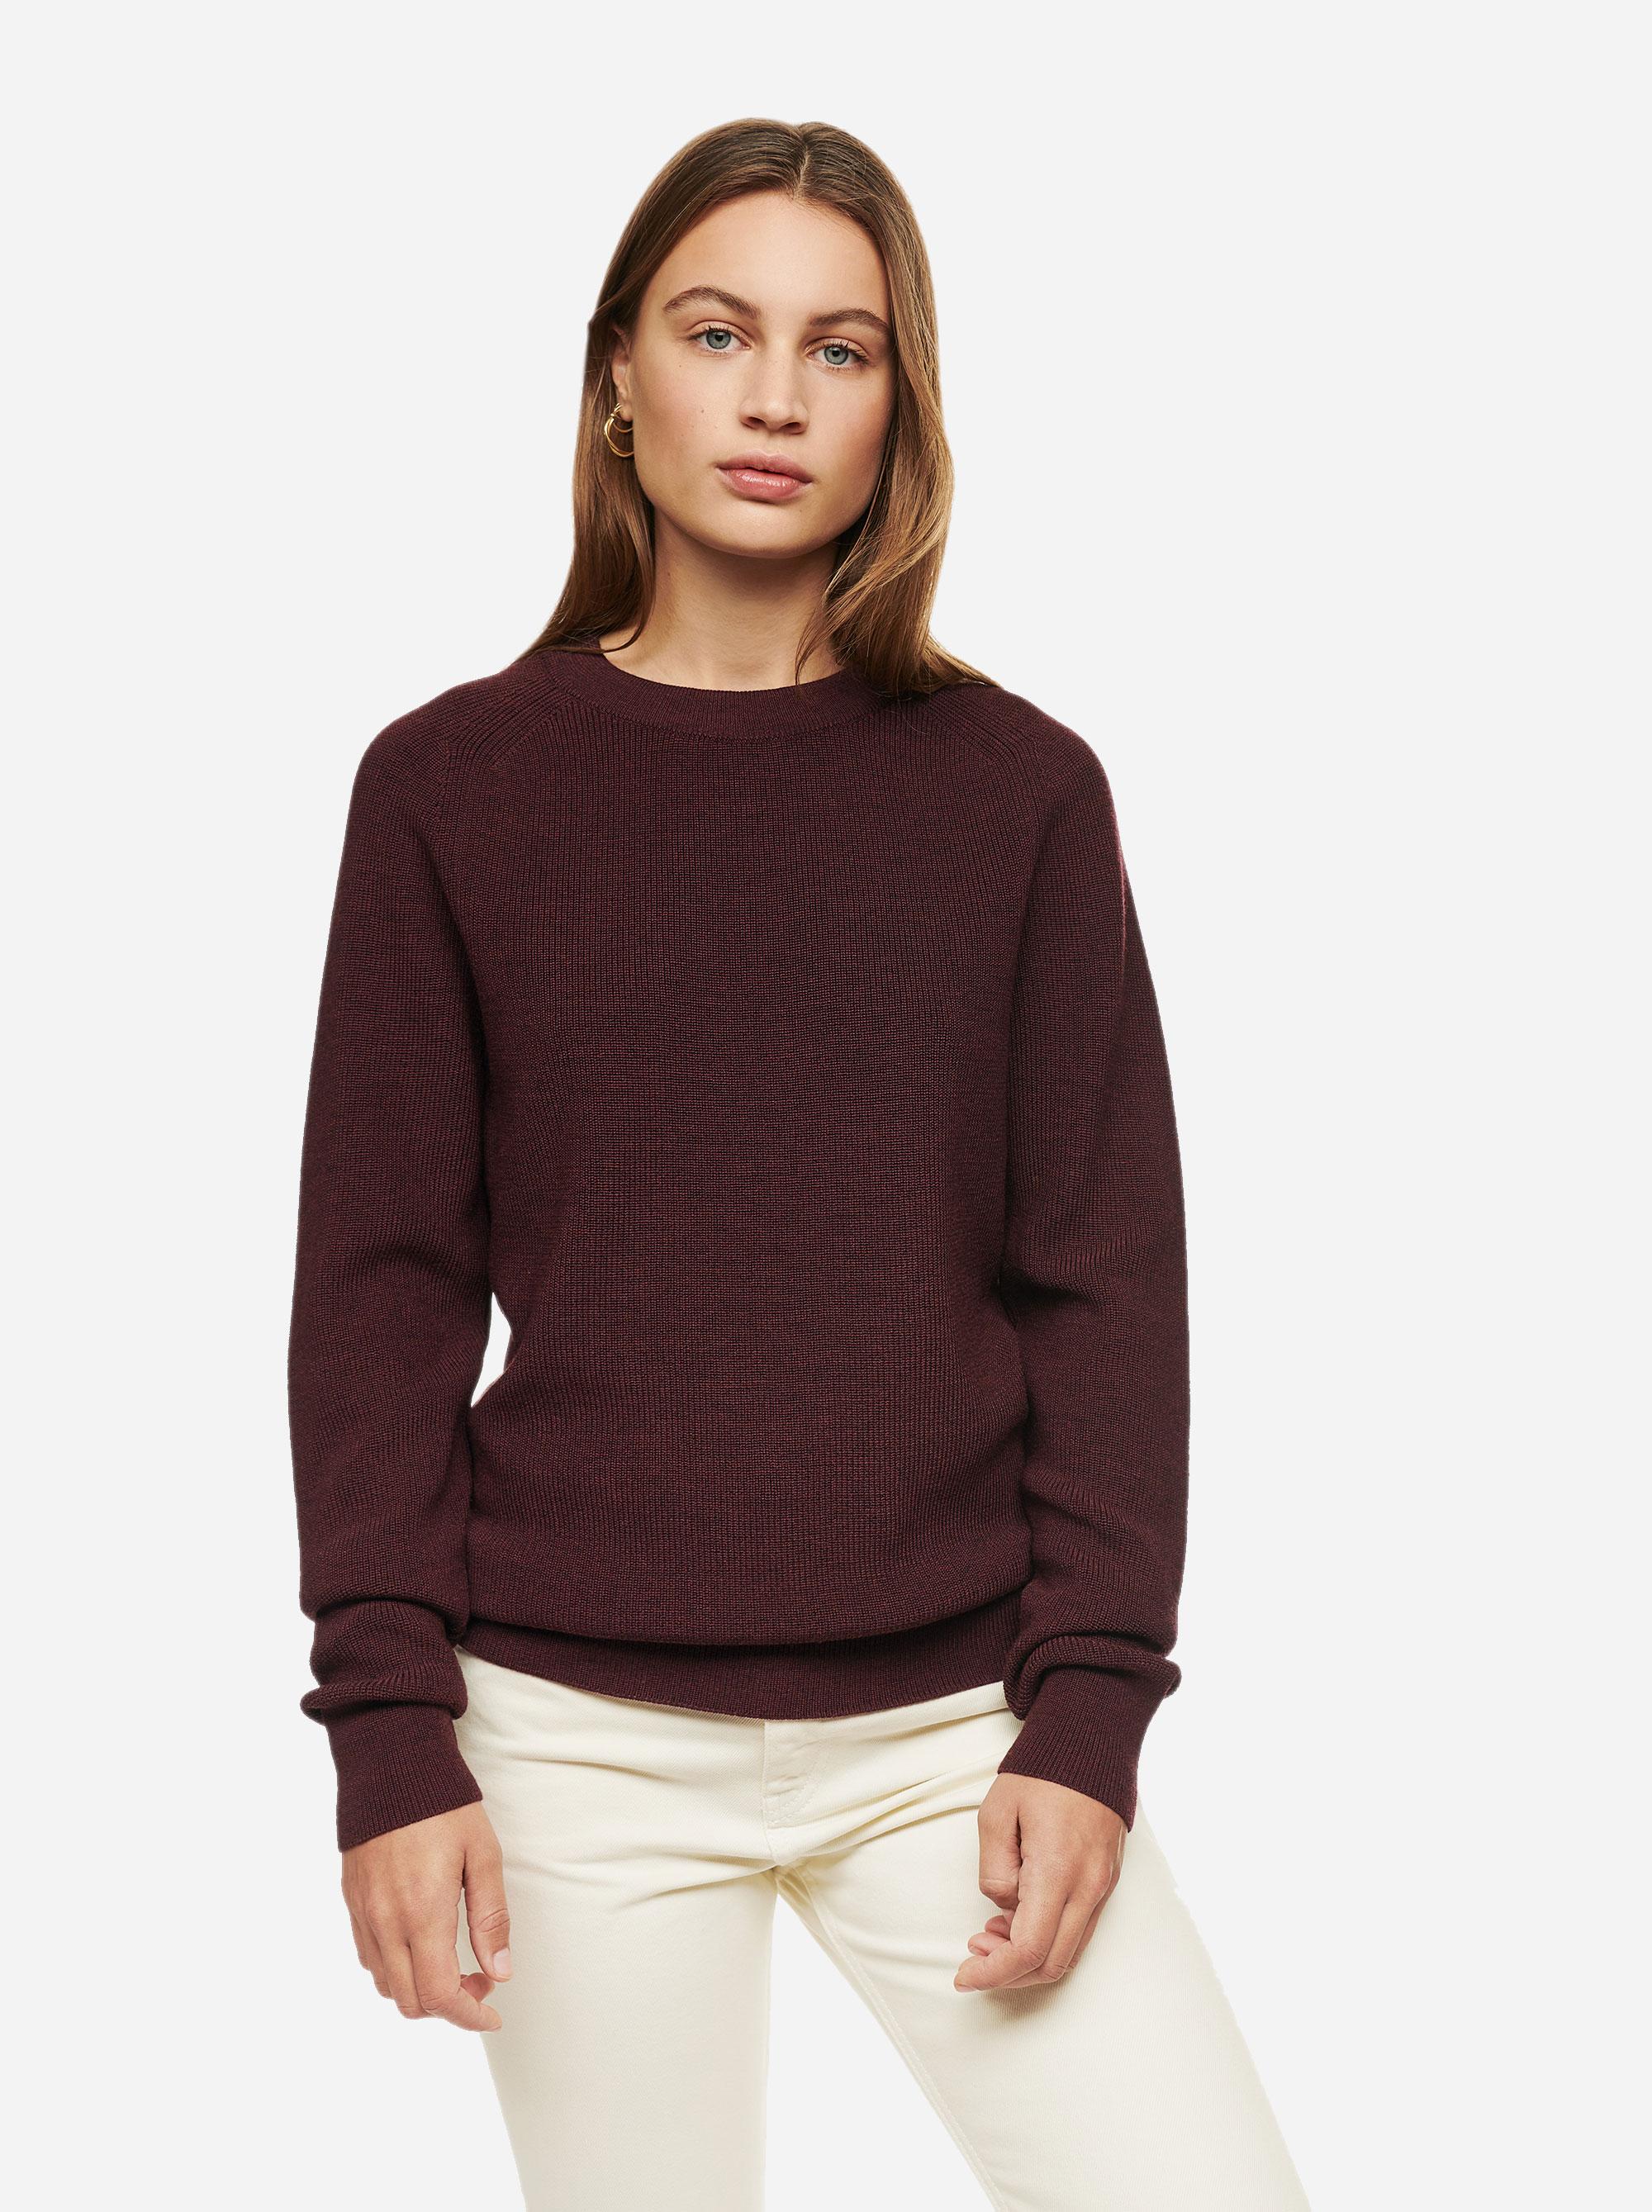 Teym - Crewneck - The Merino Sweater - Women - Burgundy - 1